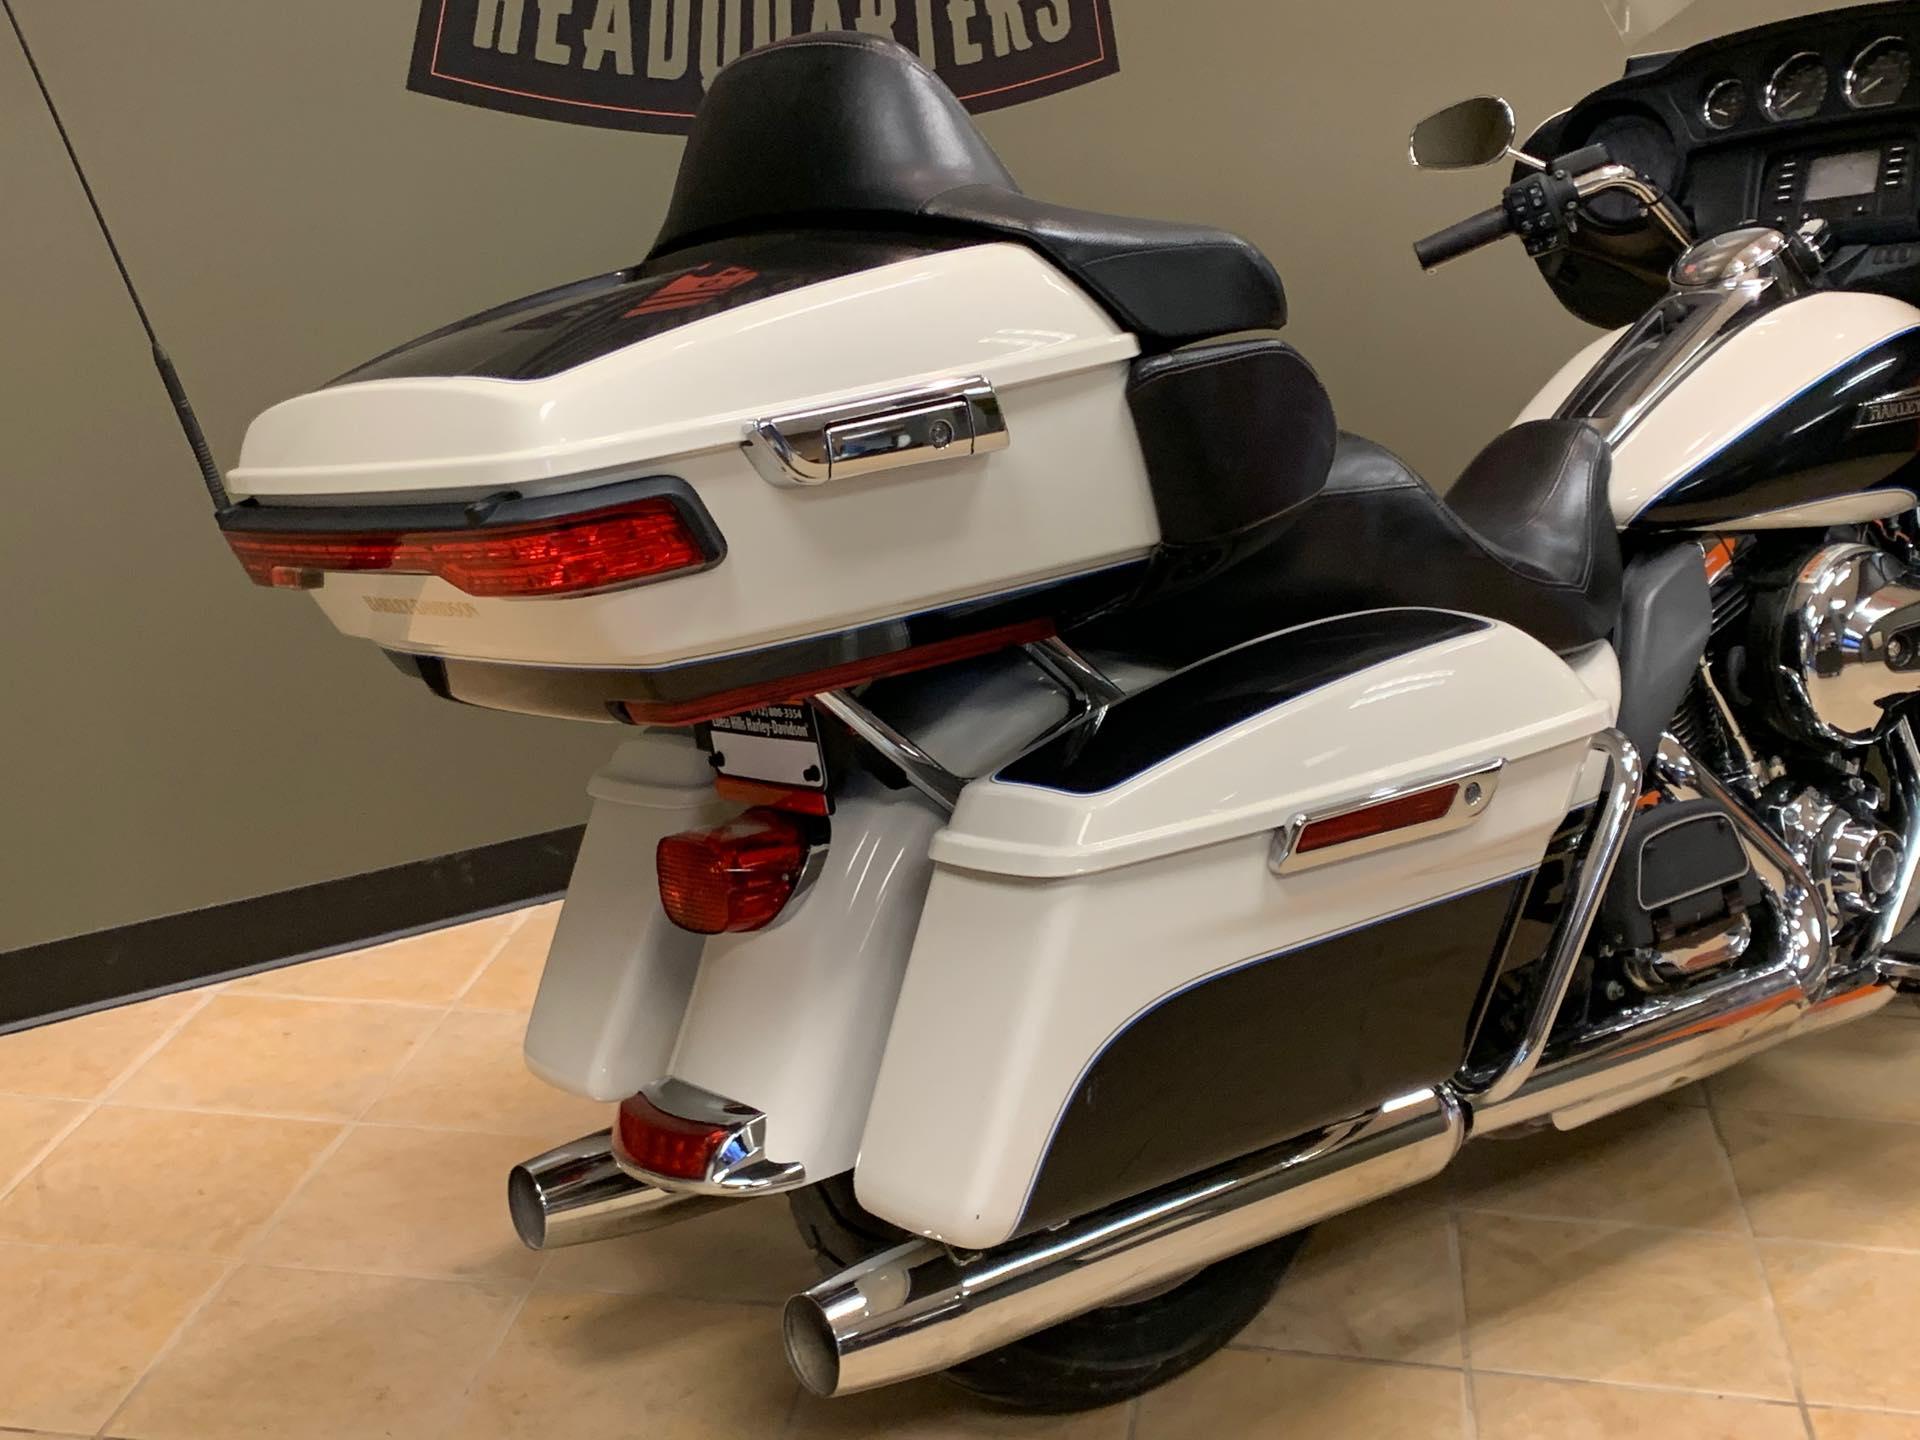 2014 Harley-Davidson Electra Glide Ultra Classic at Loess Hills Harley-Davidson